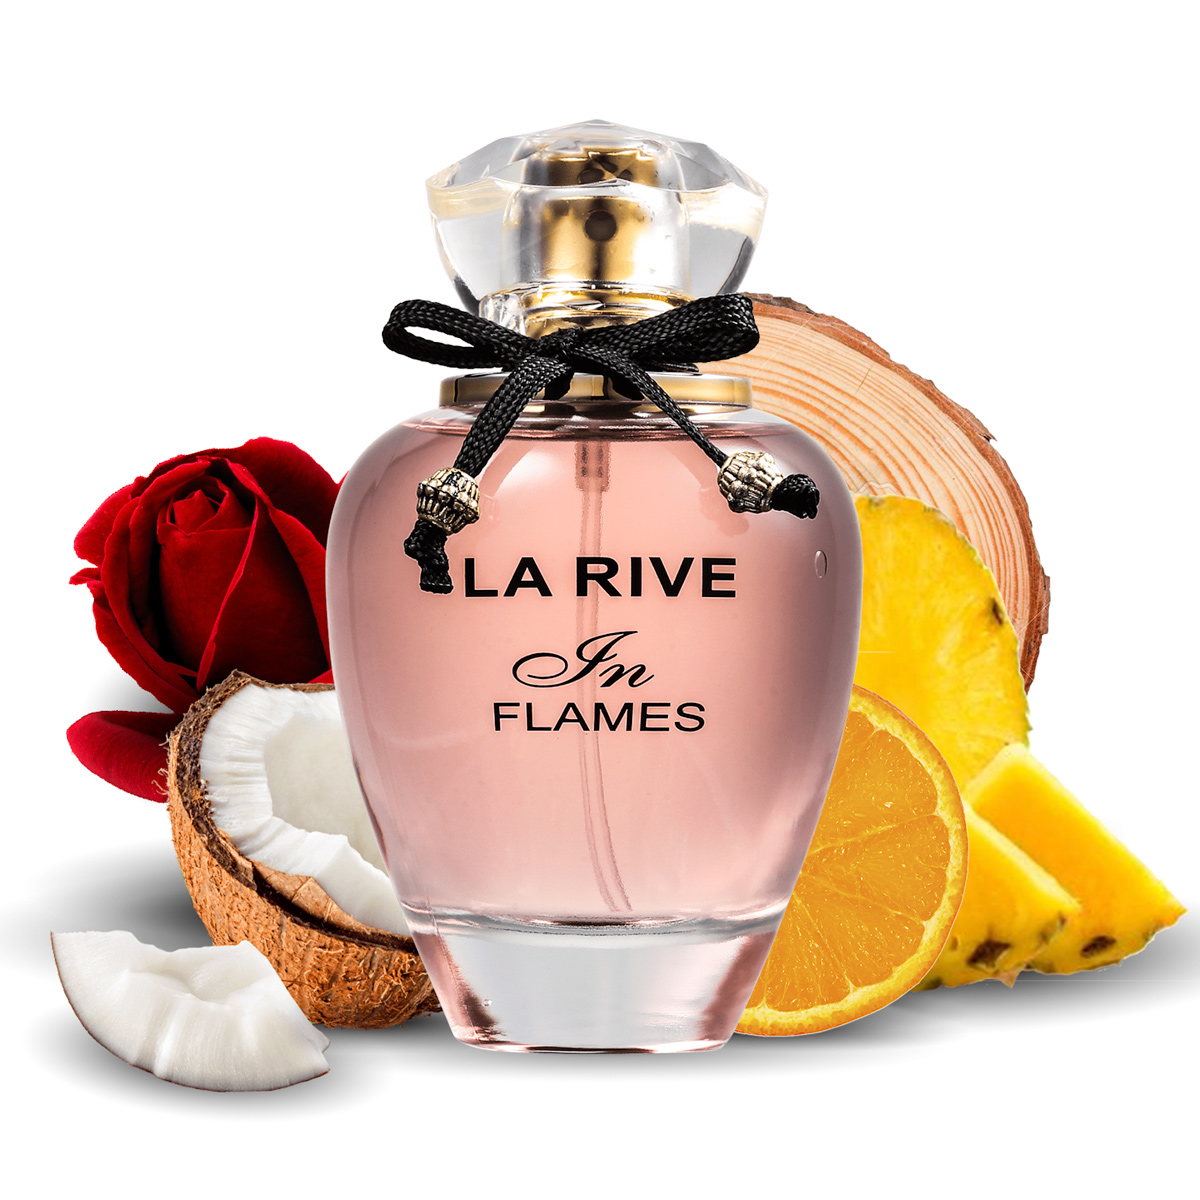 Kit 2 Perfumes Importados Cash Man e In Flames La Rive